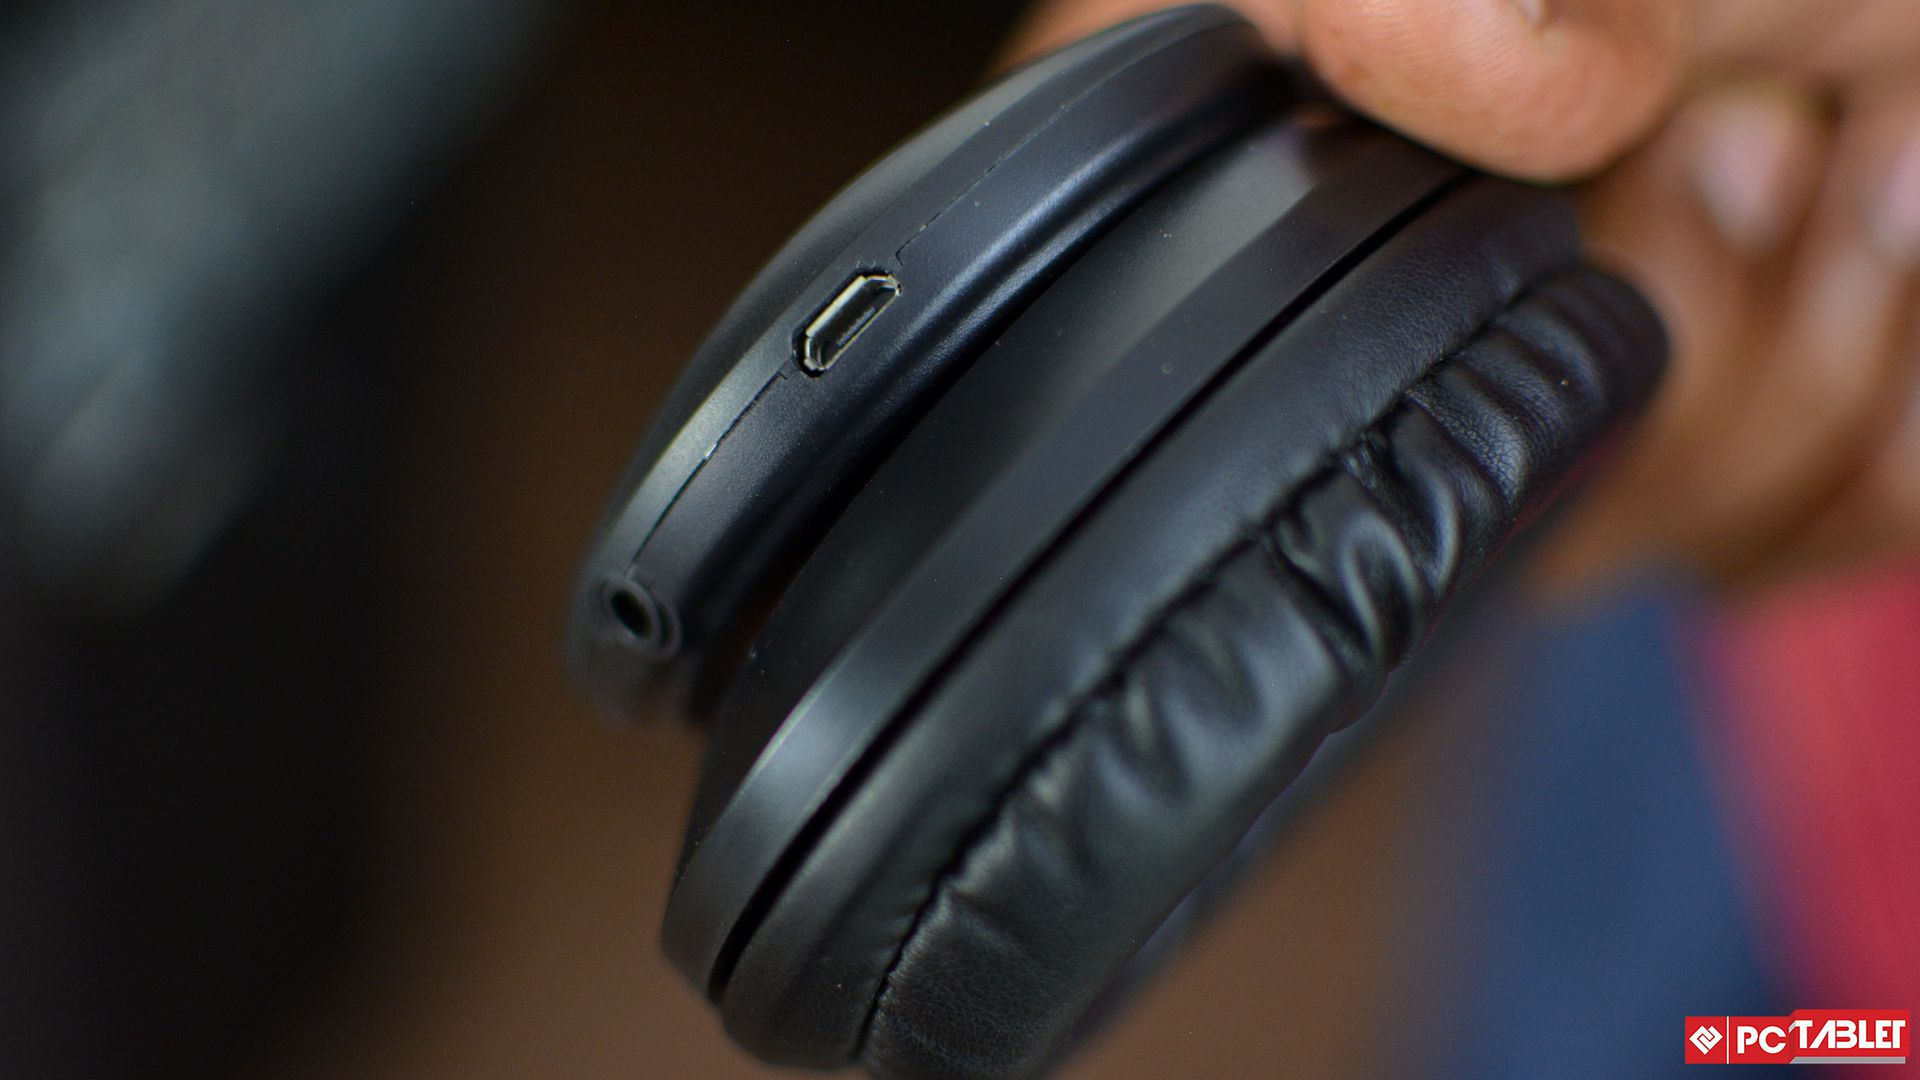 altec lansing mzw300 review these bluetooth headphones. Black Bedroom Furniture Sets. Home Design Ideas